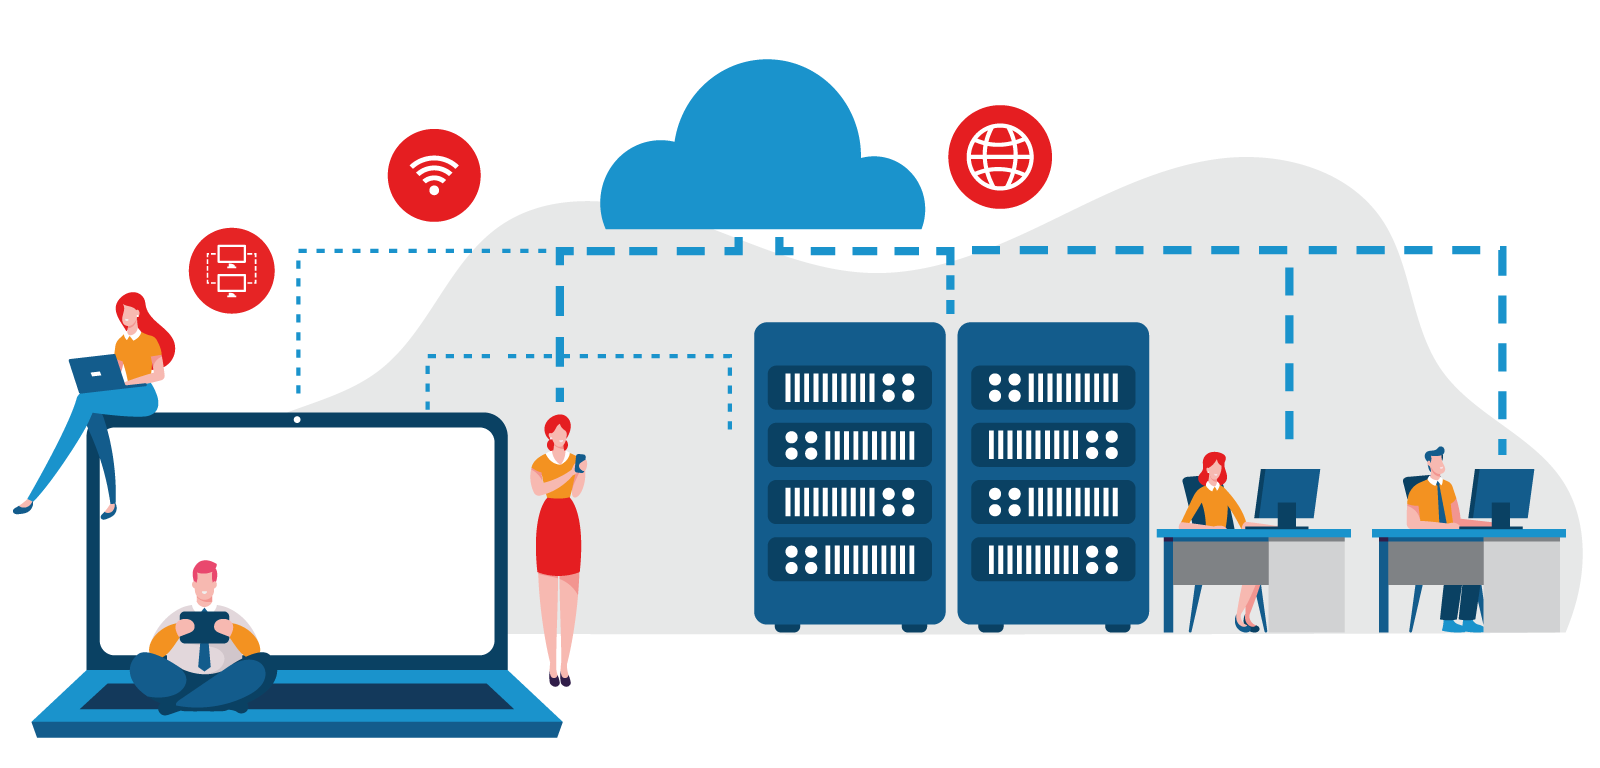 Post-Corona-Konzept - IT-Sicherheit & Software-Ergonomie